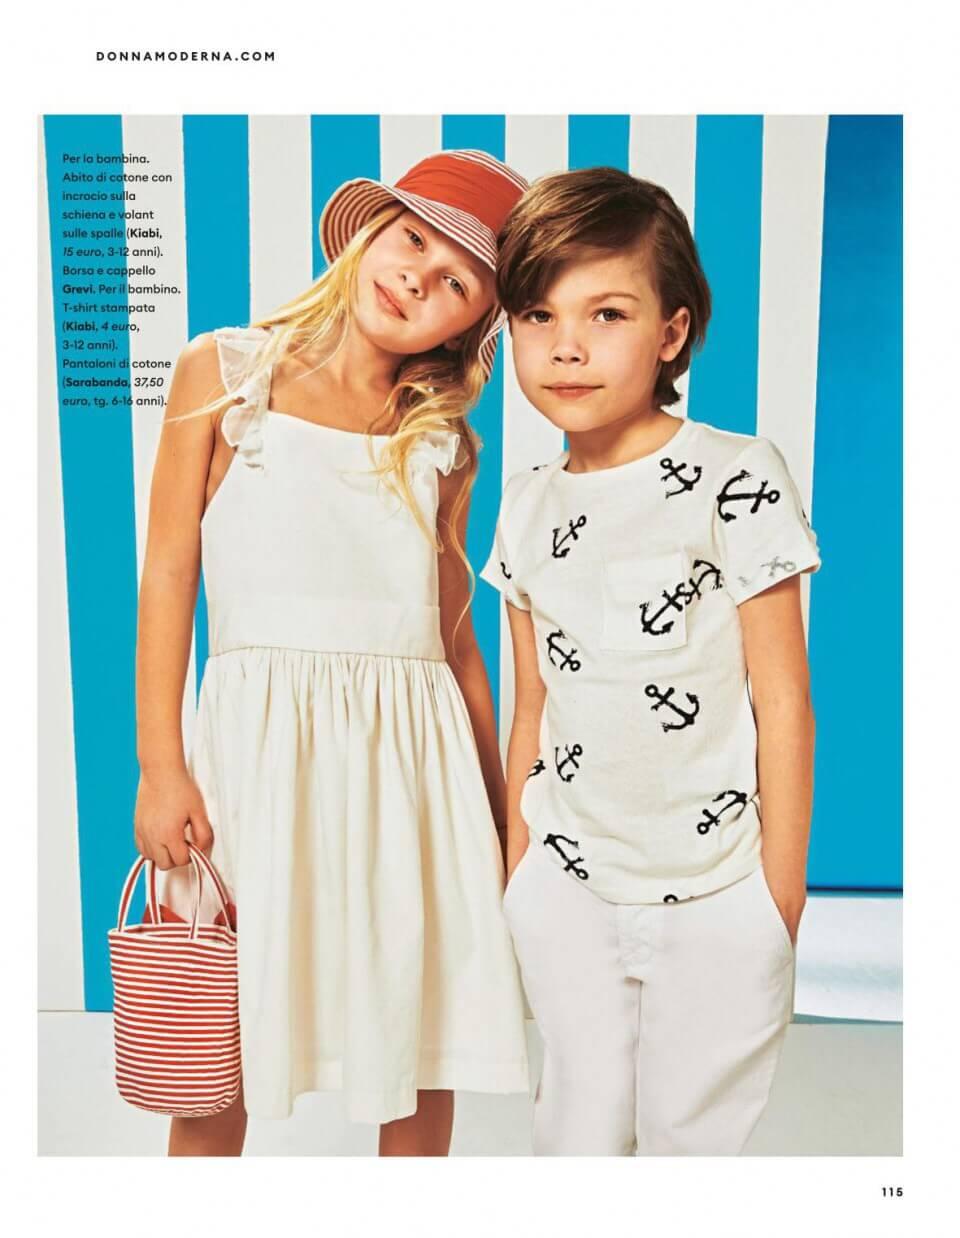 Donna moderna marzo 2019 cappello speciale bambino grevi